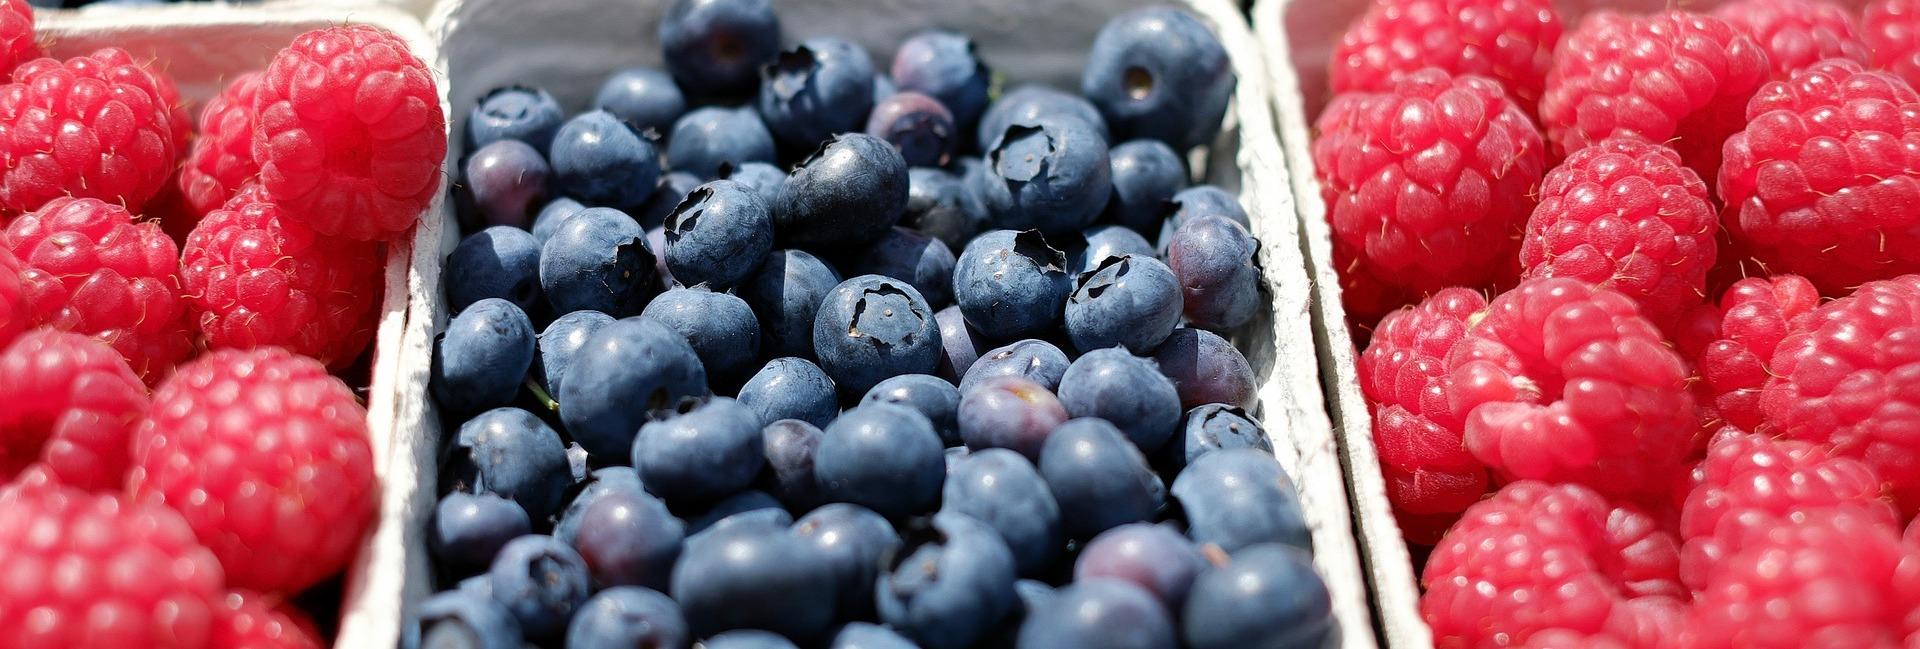 Berries 1493905 1920